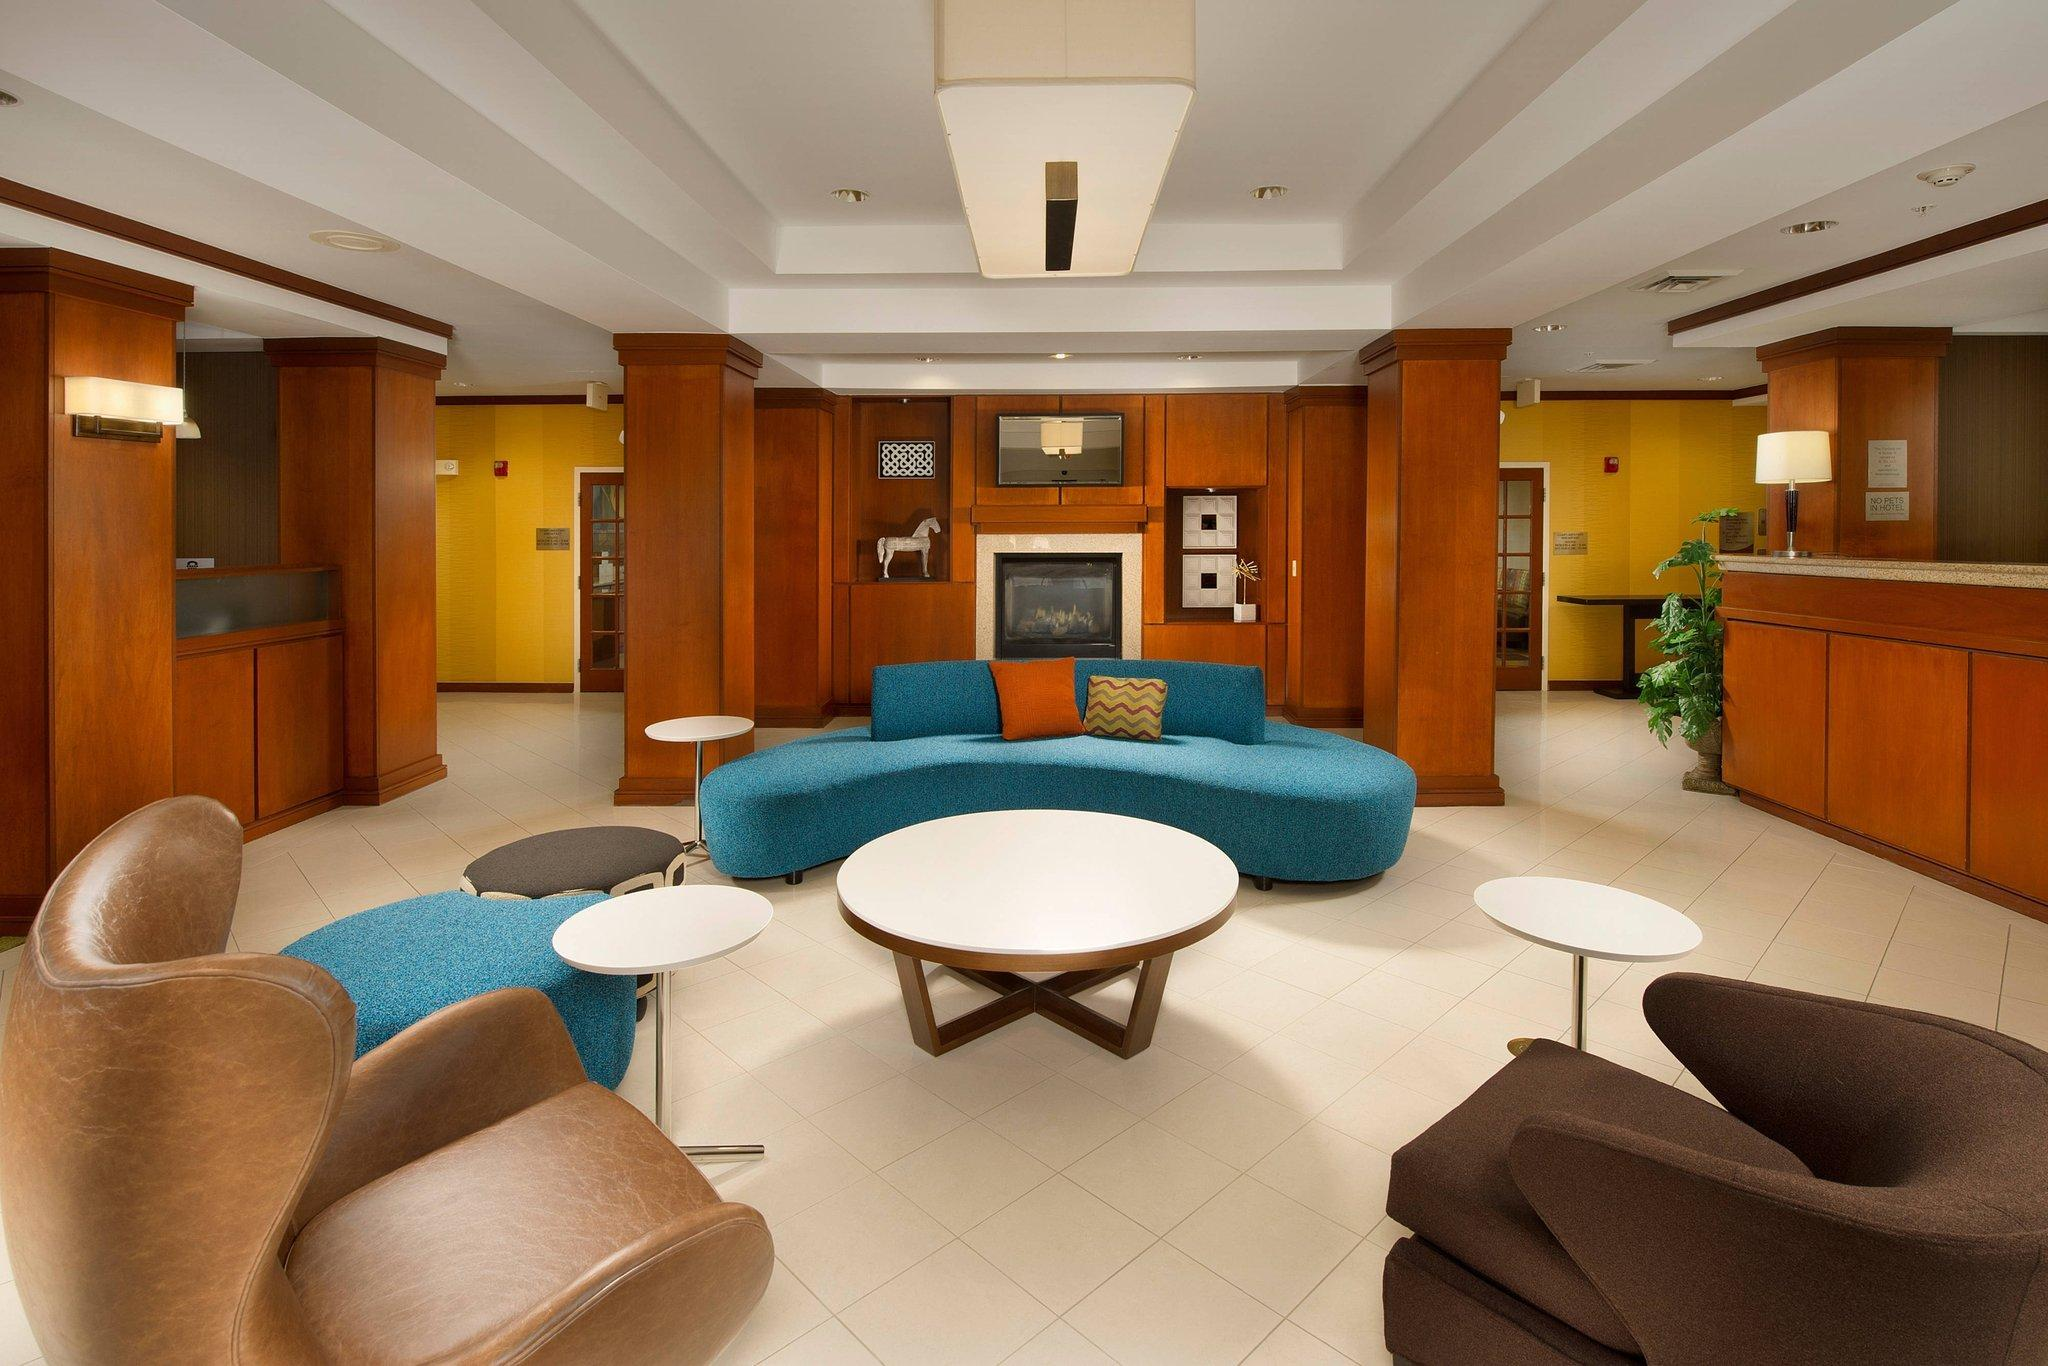 Fairfield Inn And Suites Waco North